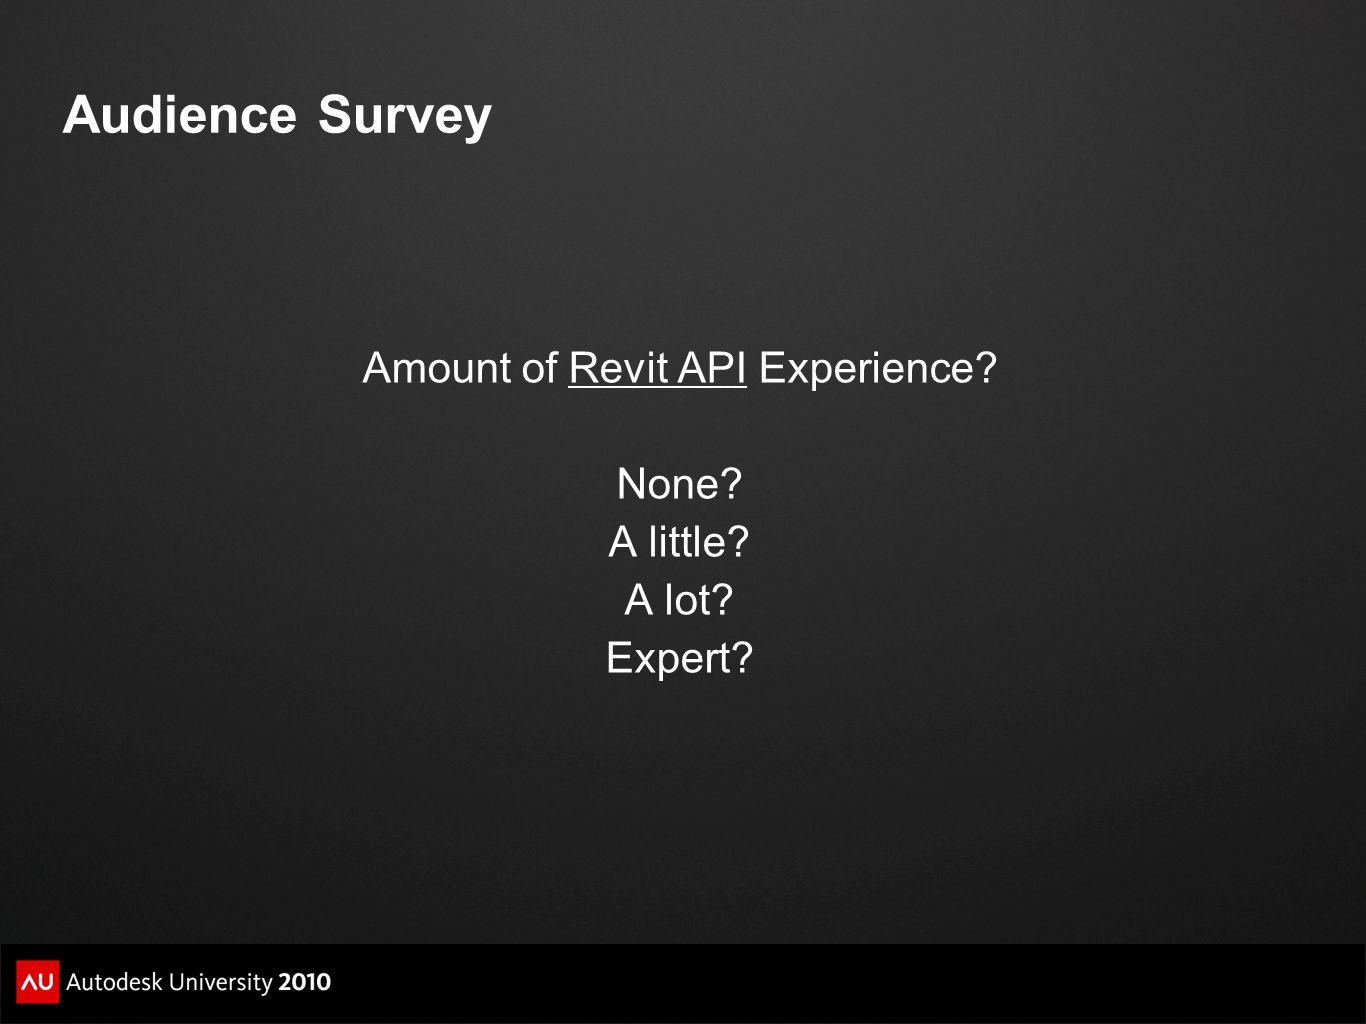 Amount of Revit API Experience